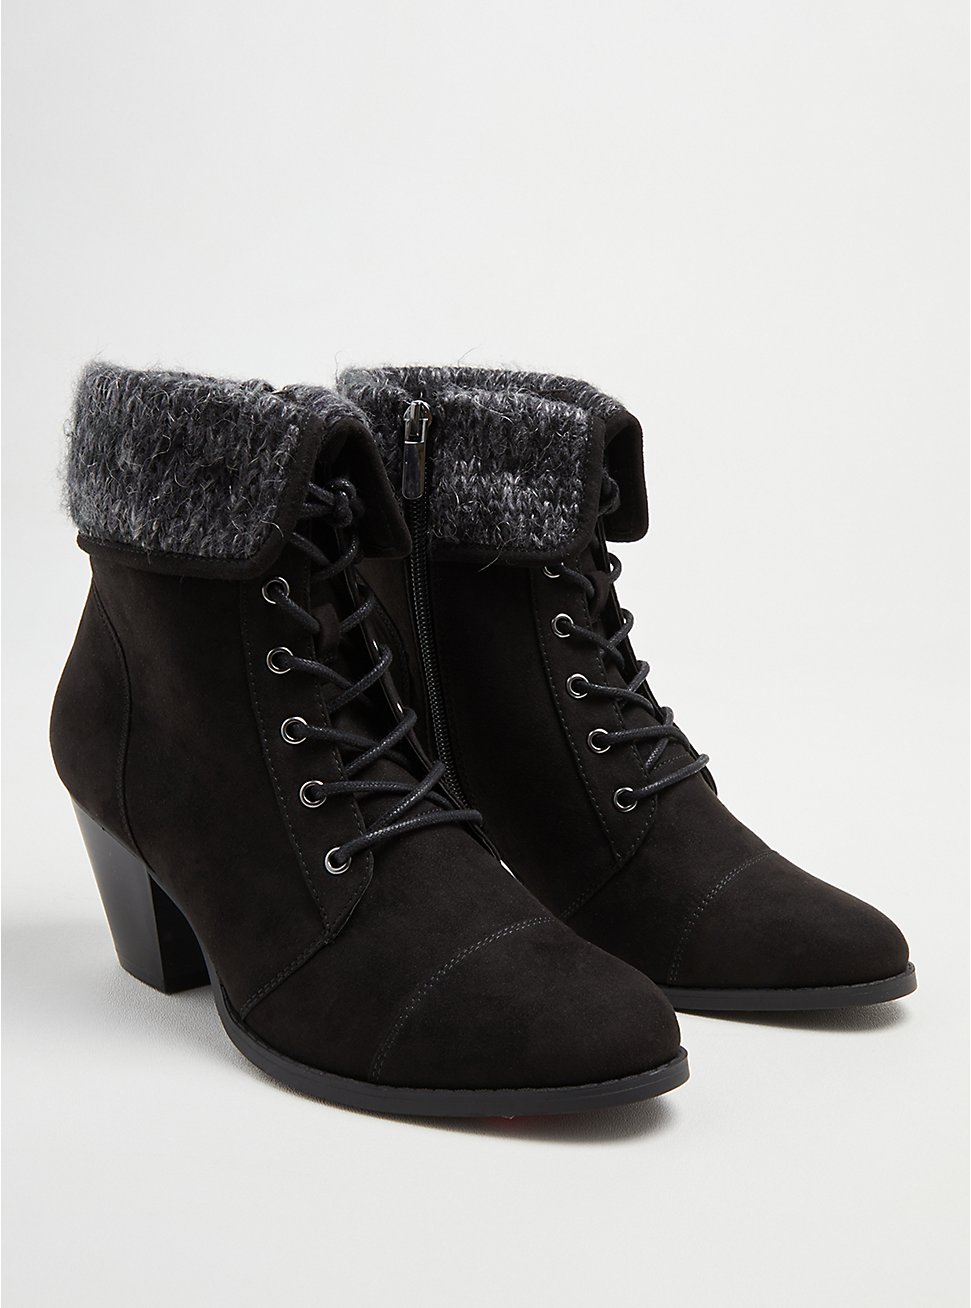 Sweater Heel Bootie - Black Faux Suede (WW), BLACK, hi-res